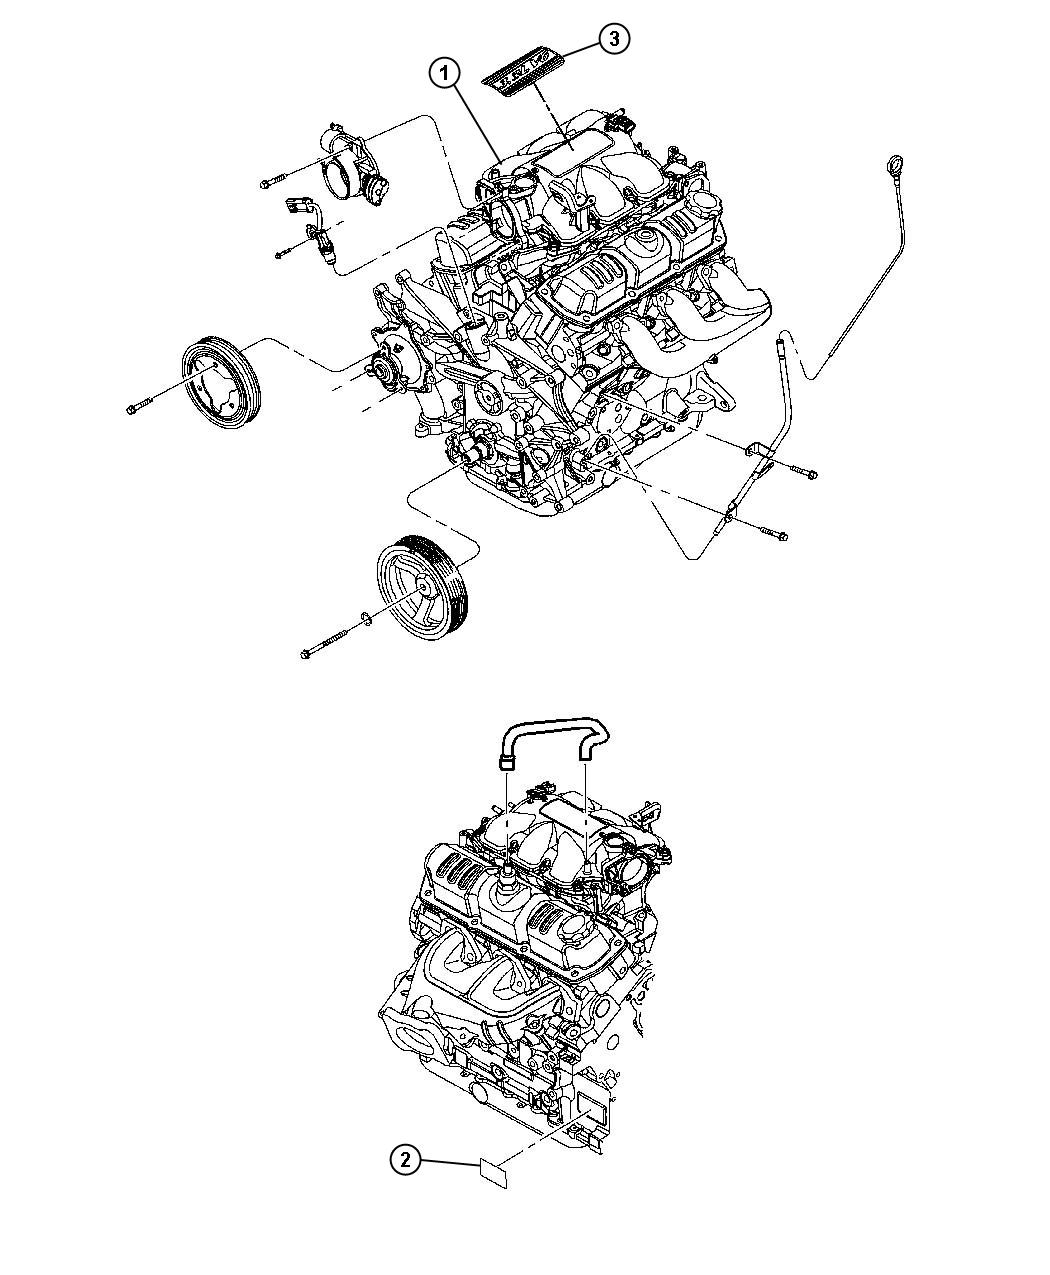 Jeep Wrangler Engine. Long block. Remanufactured